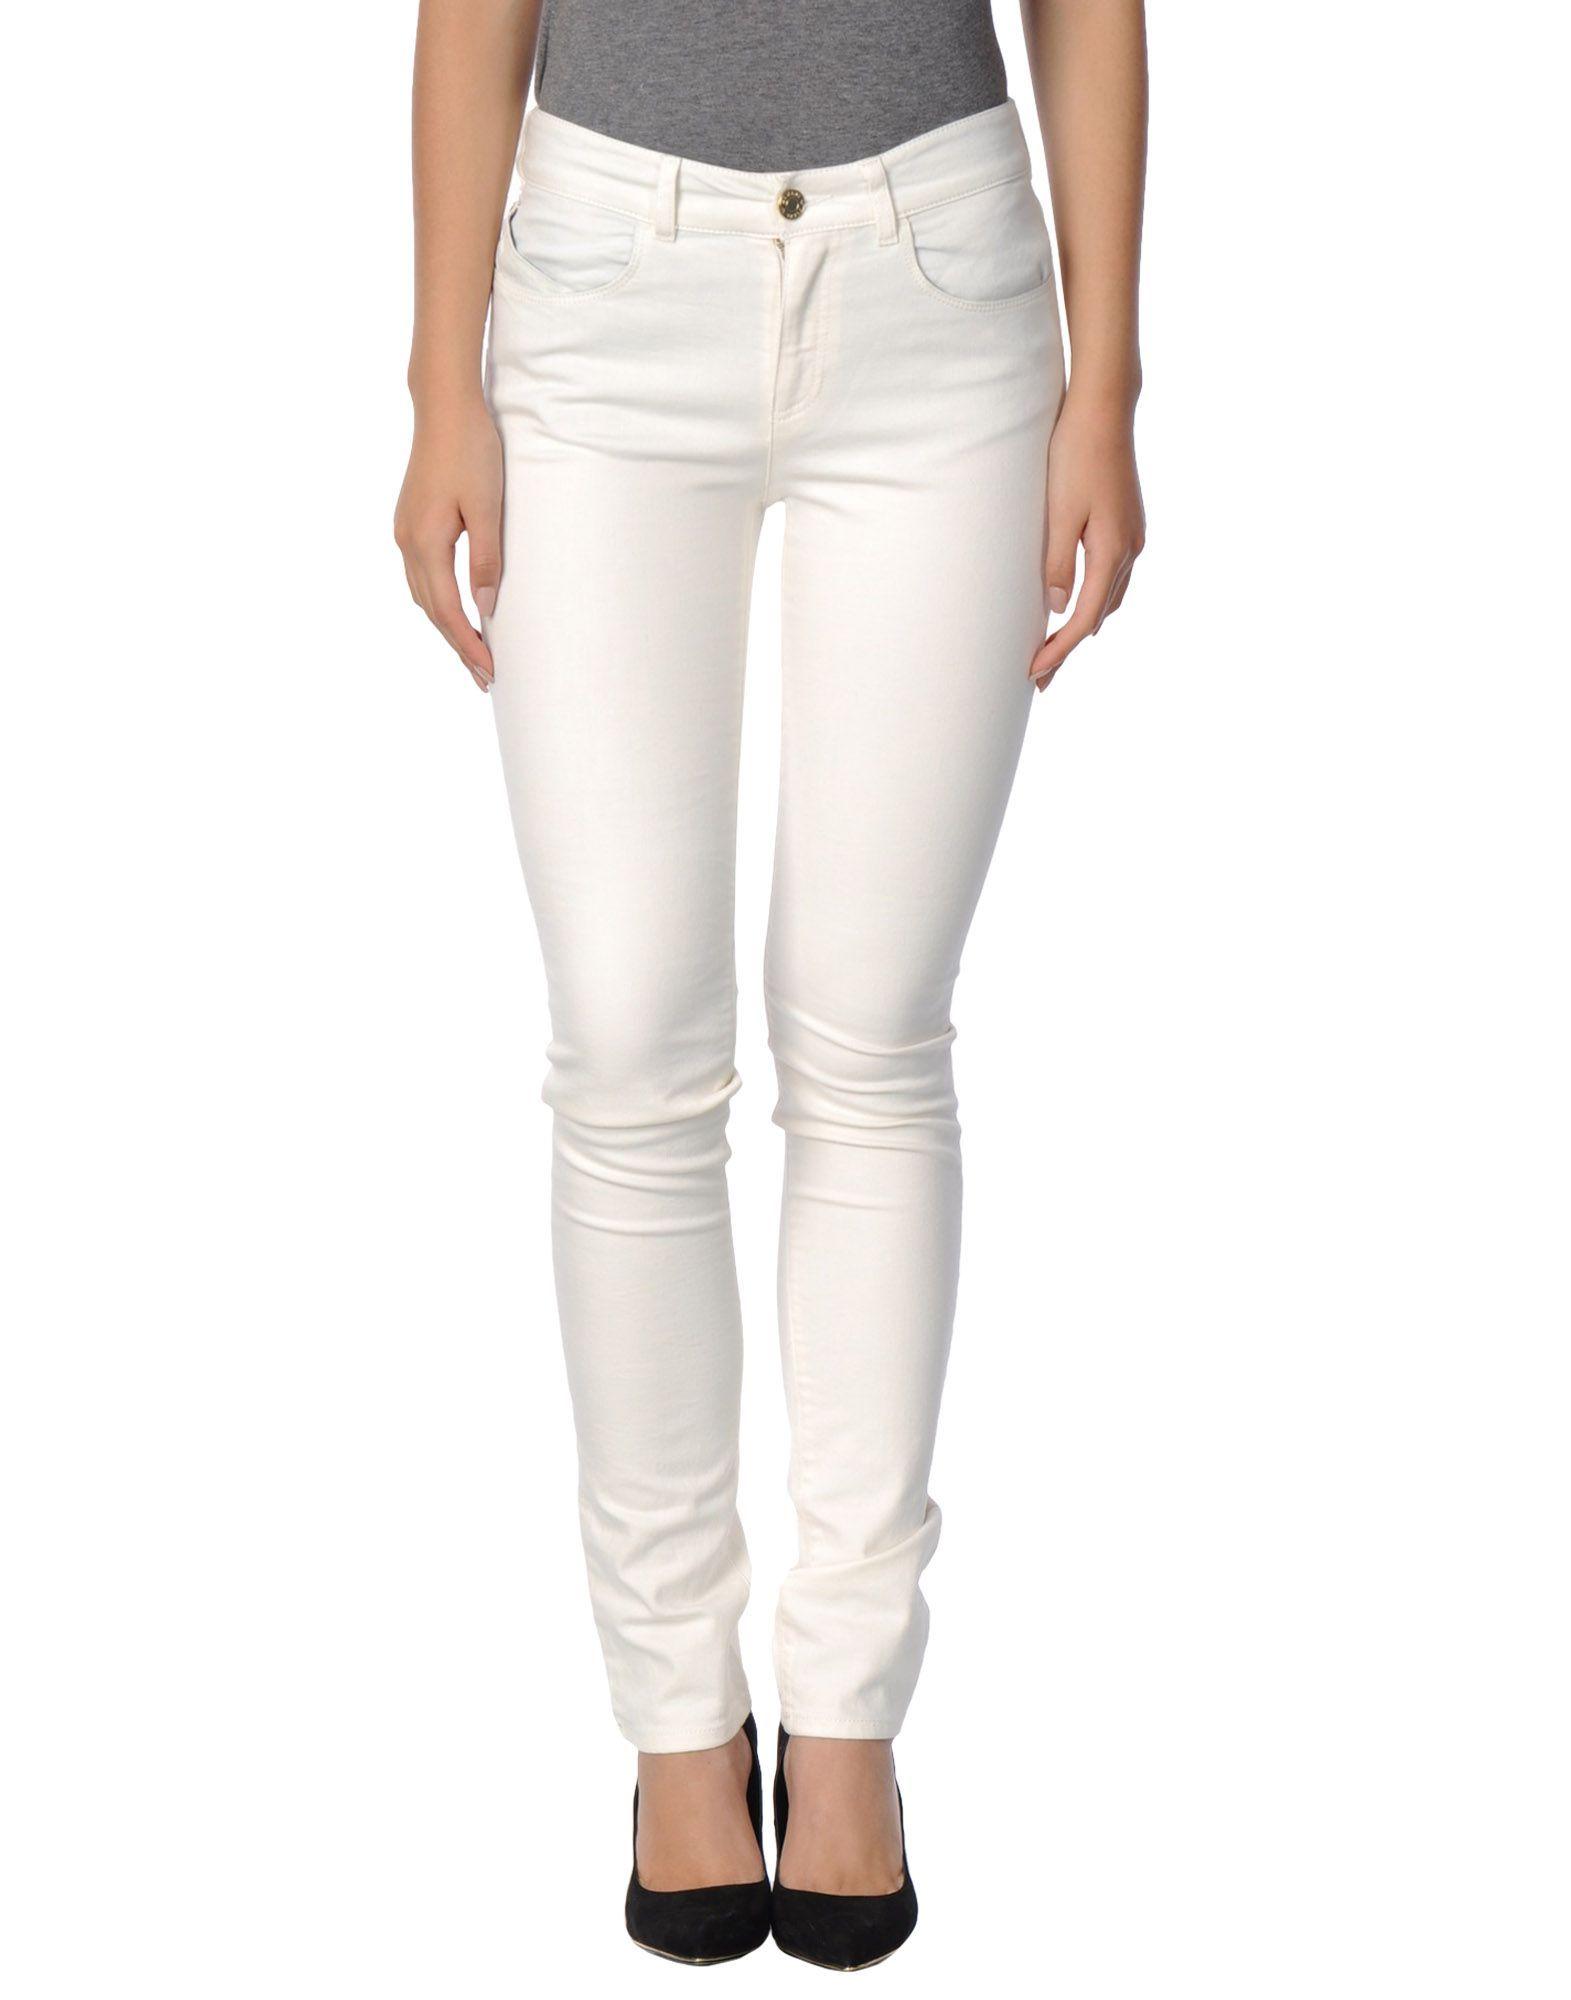 Armani Jeans Ivory Cotton Pantaloni jeans